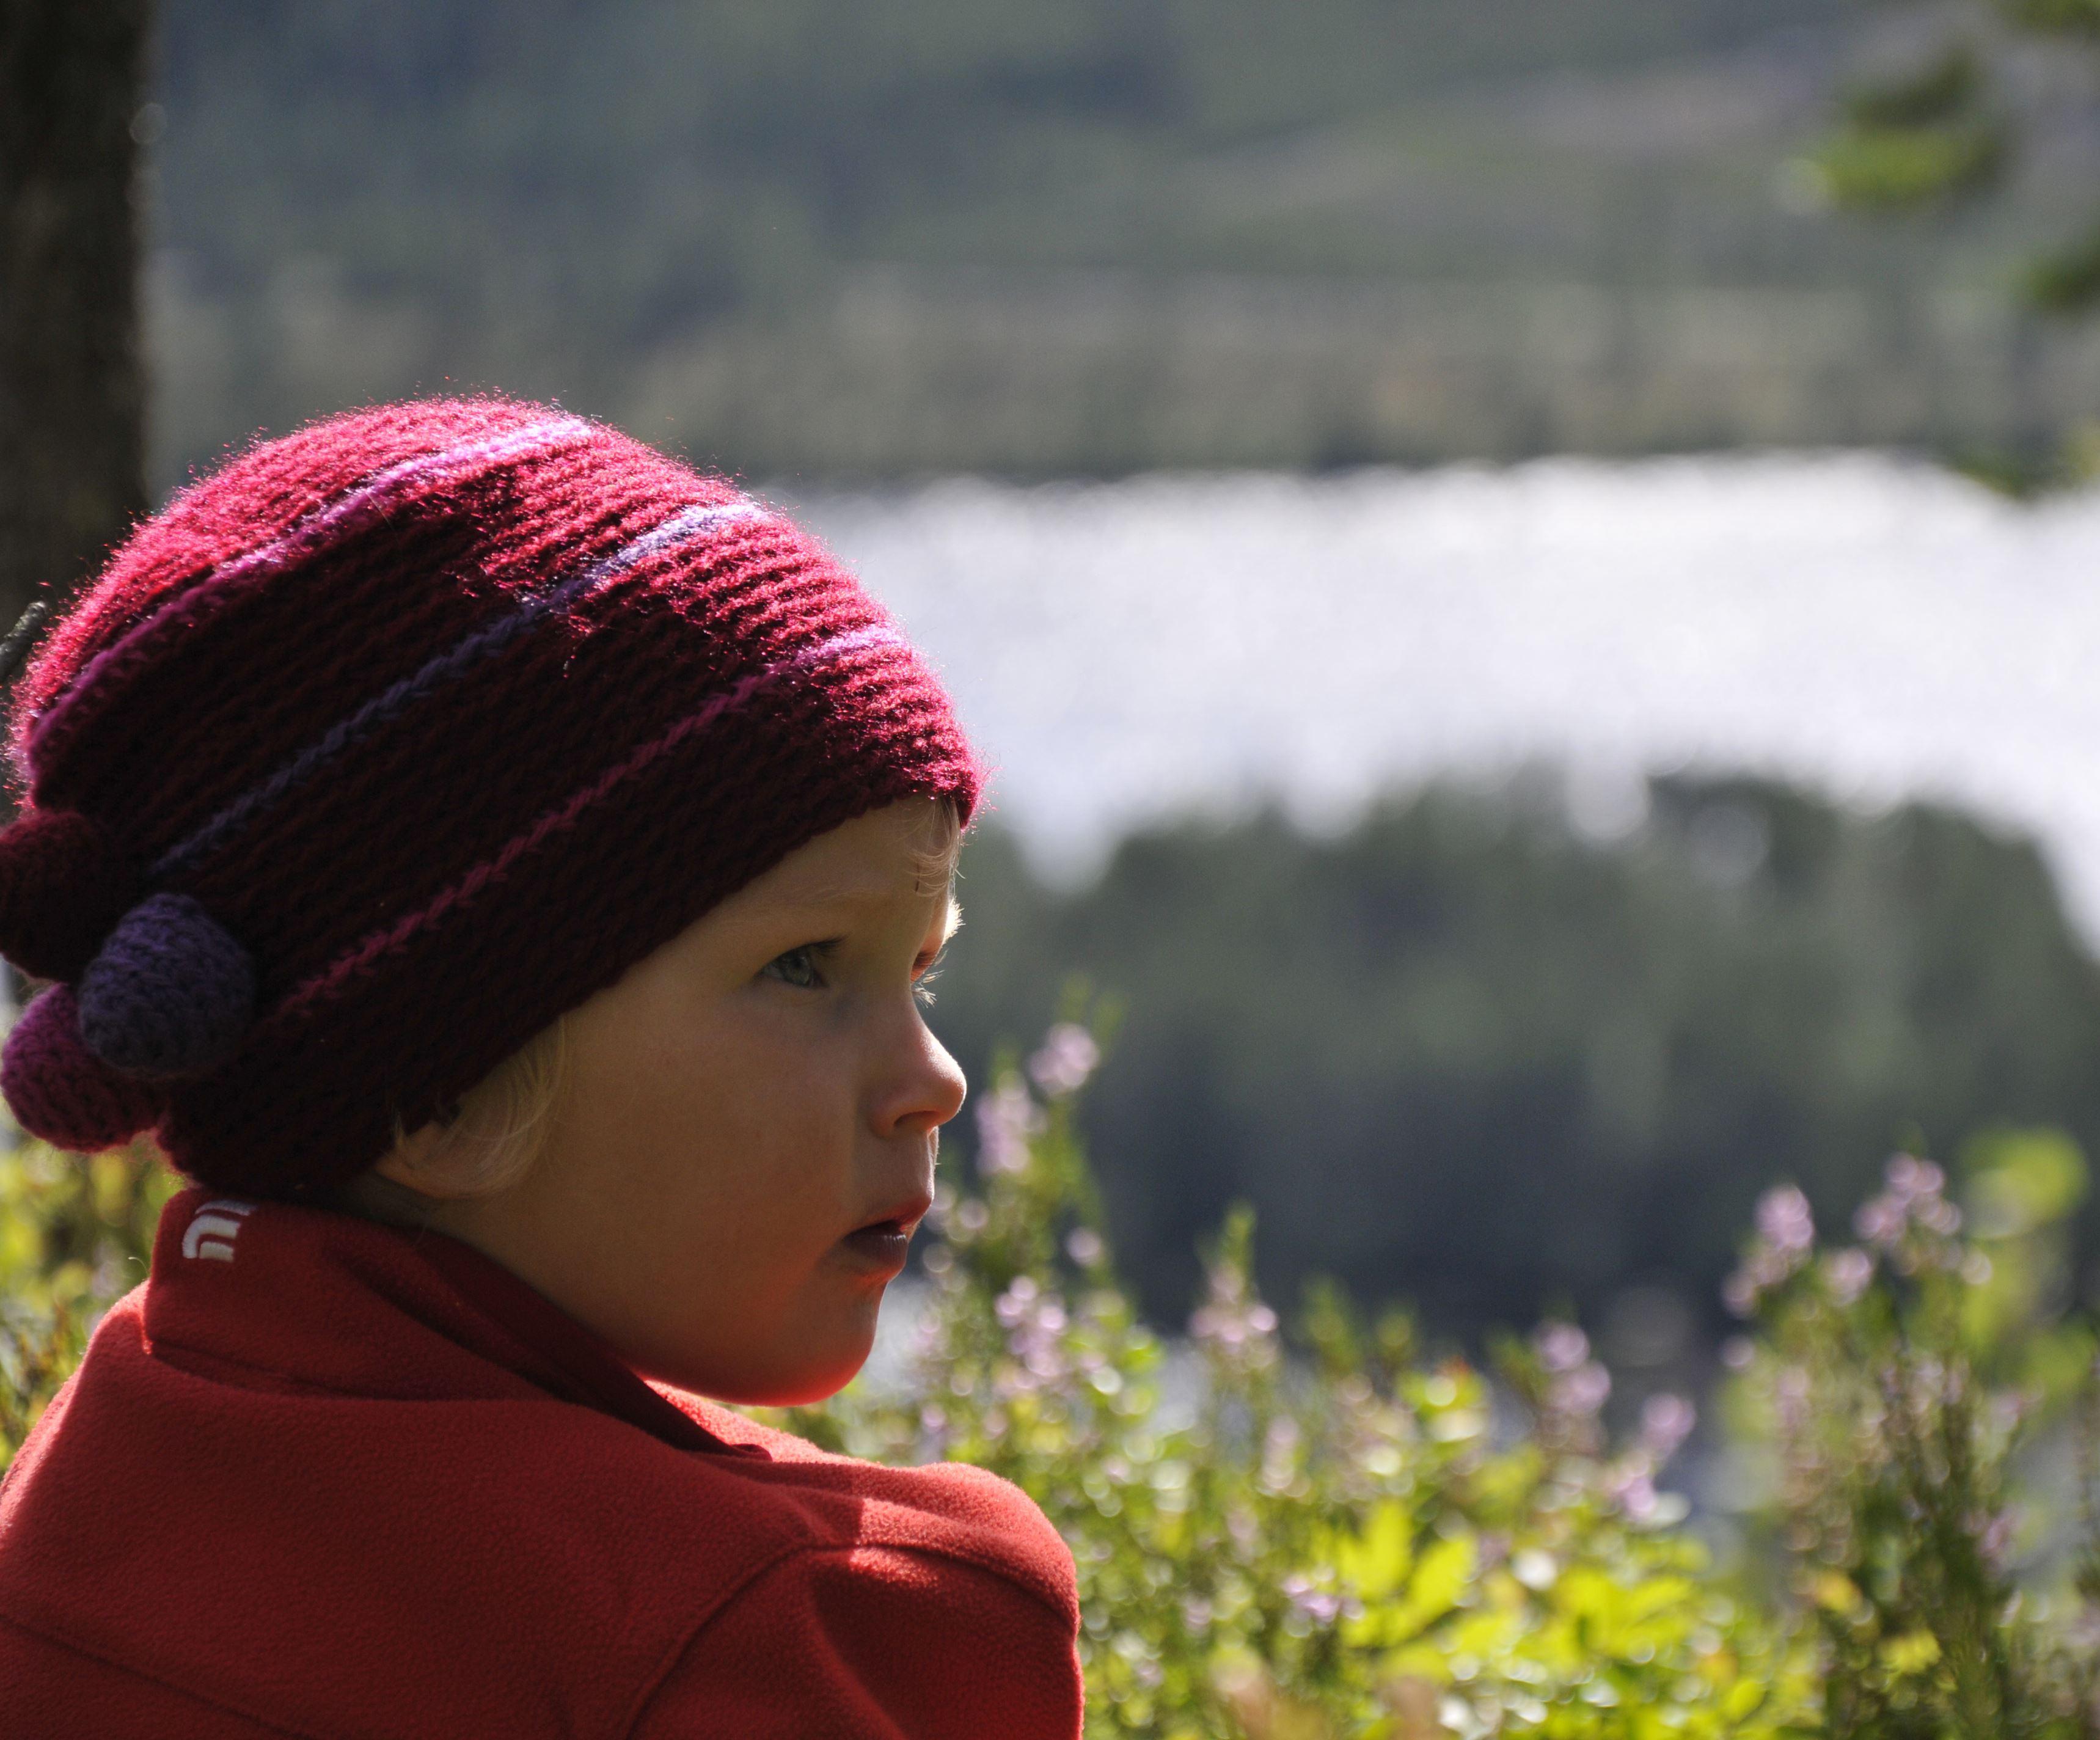 Besök Starrbergets naturreservat